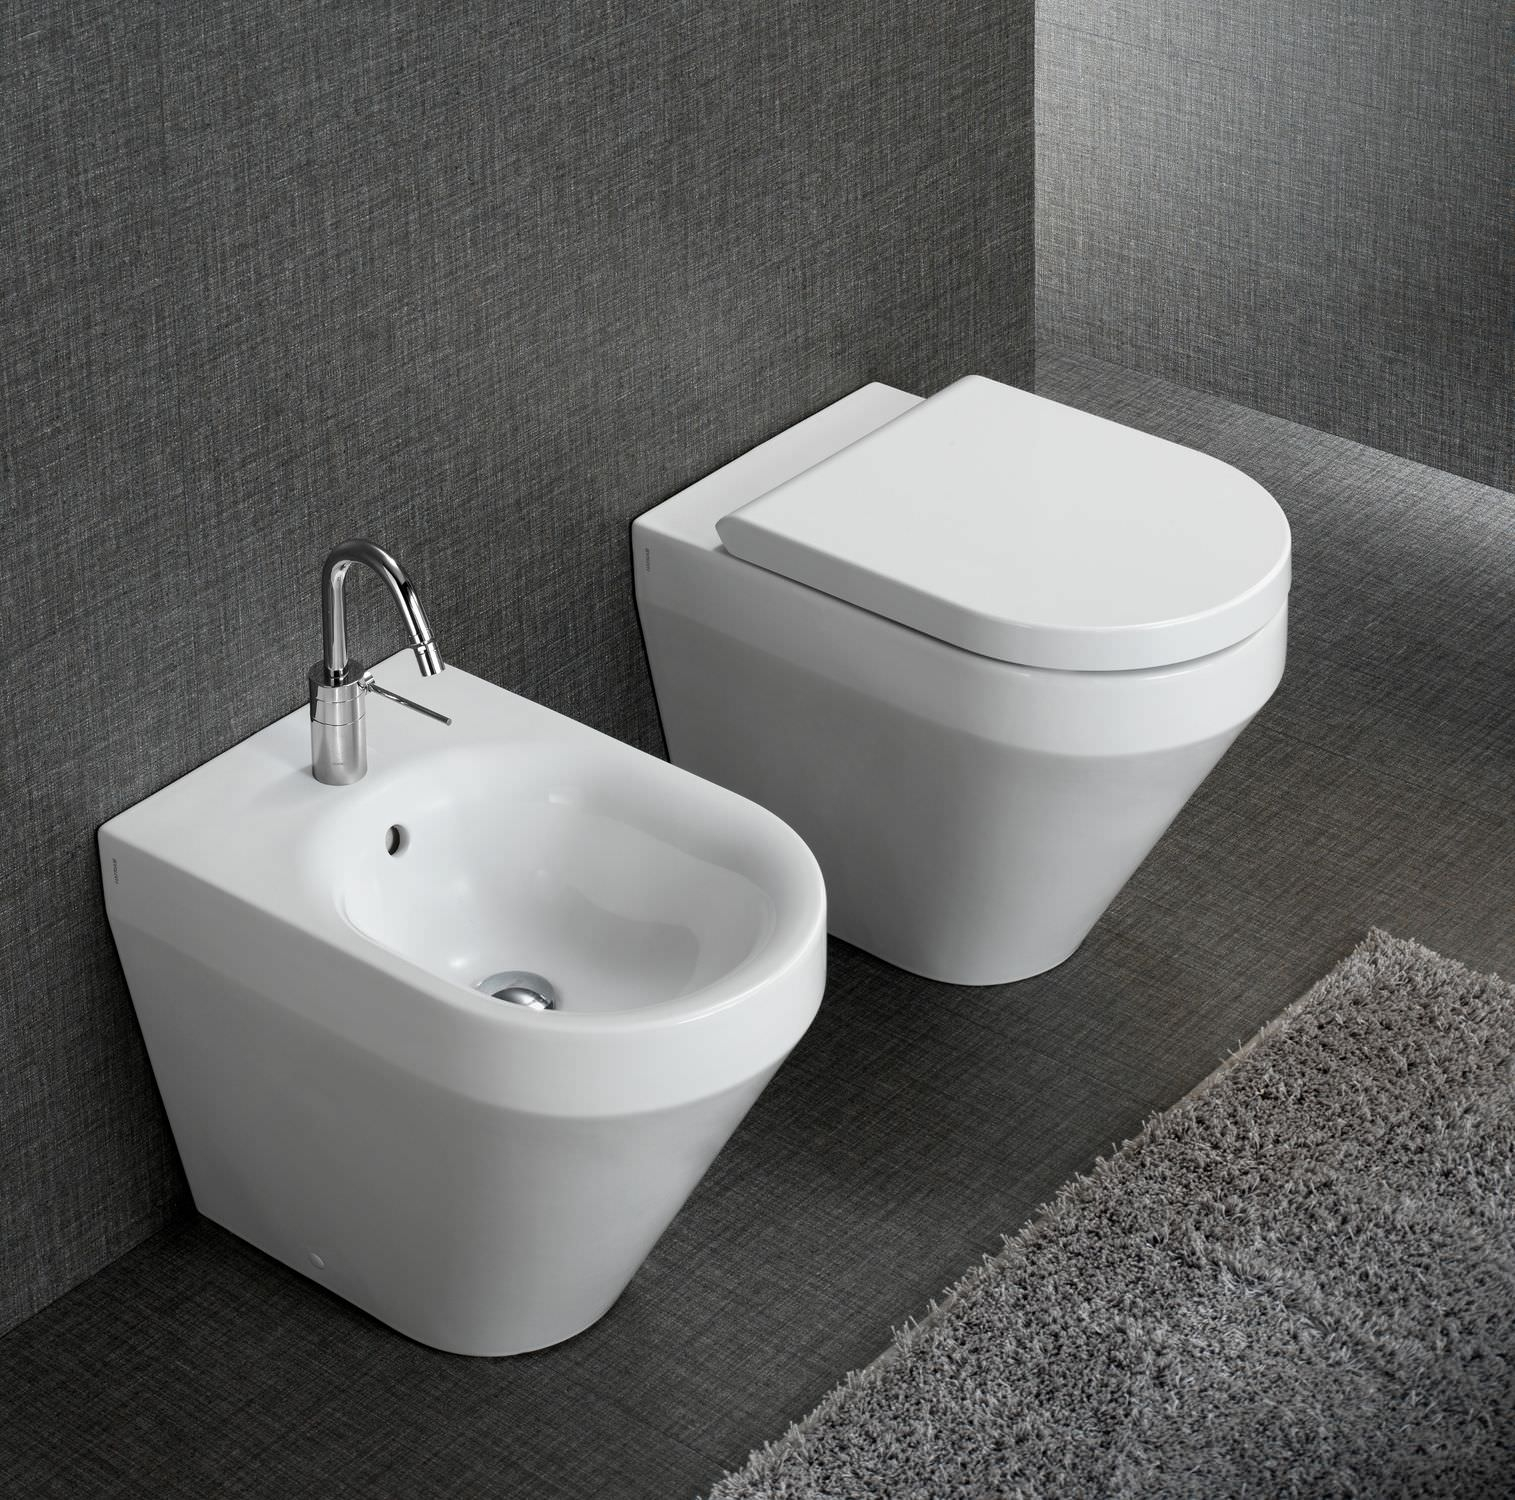 freestanding toilet  ceramic  yxv  hatria srl - freestanding toilet  ceramic  yxv